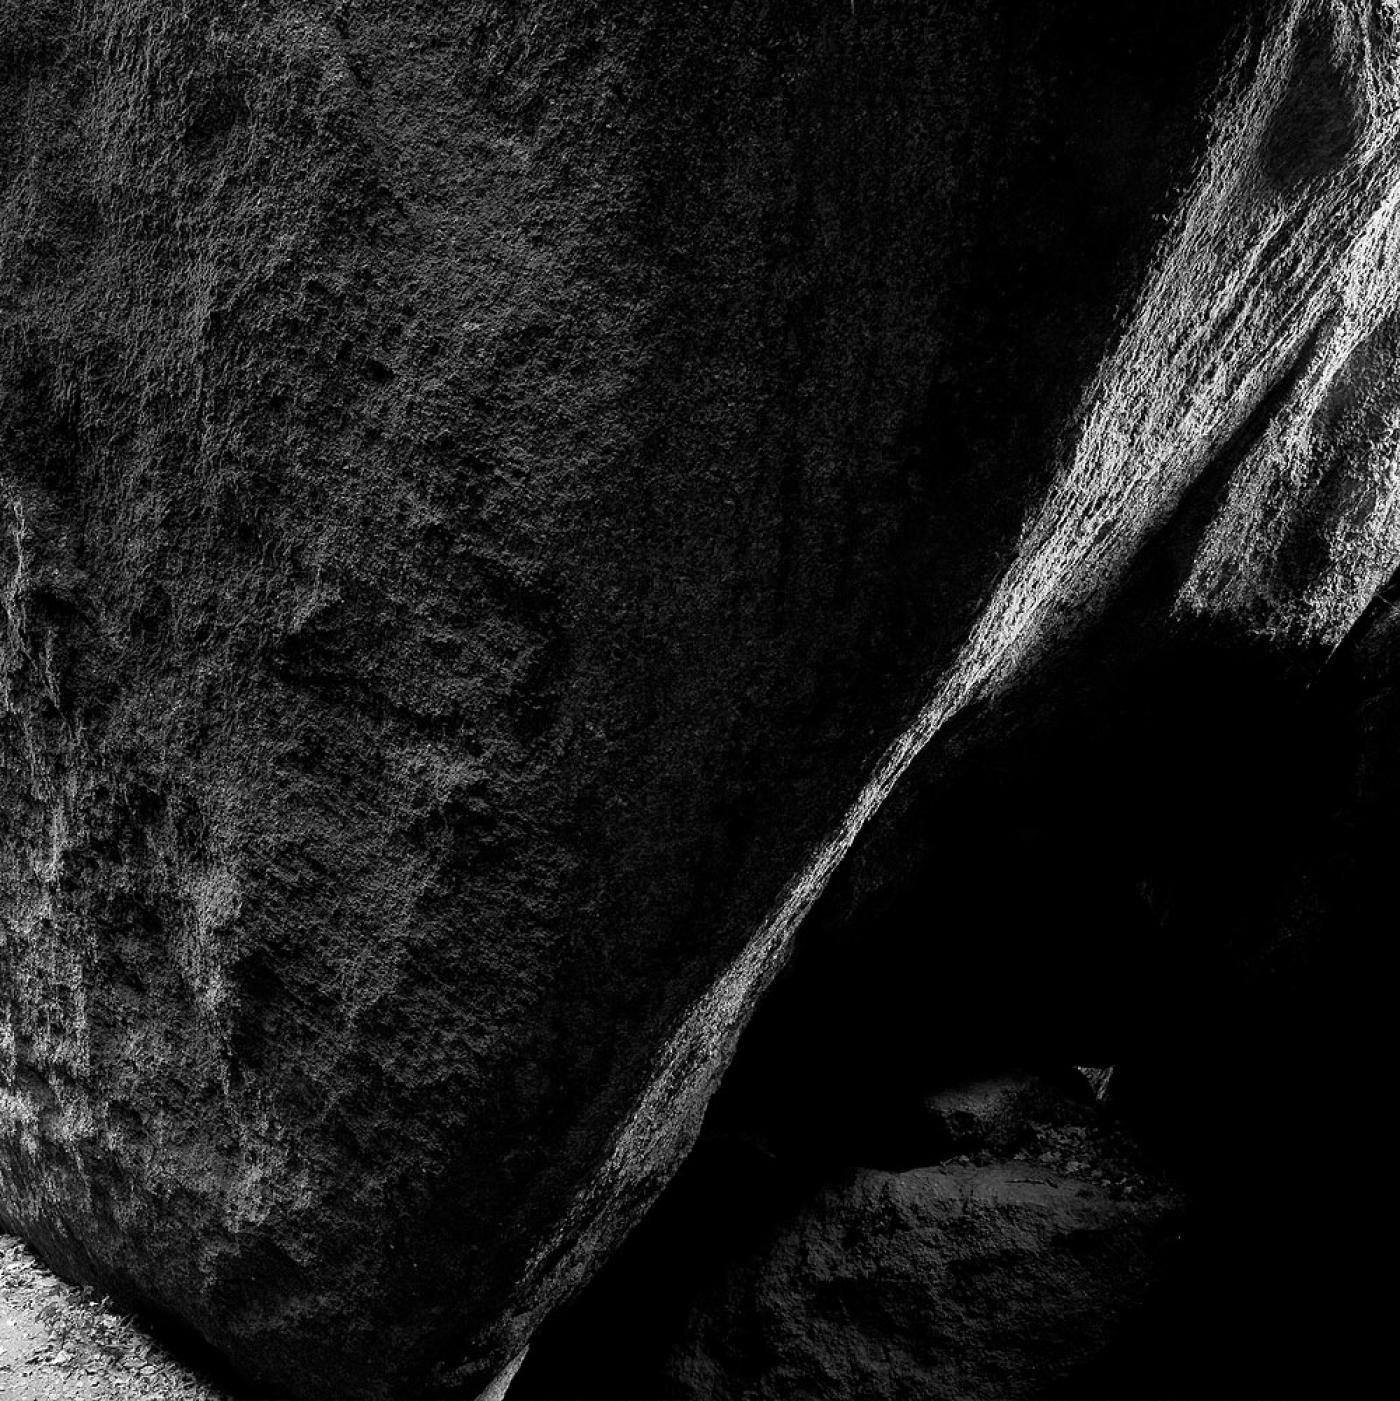 https://www.ericmalemanche.com/imagess/topics/les-bretons-de-l-argoat/liste/Huelgoat.jpg